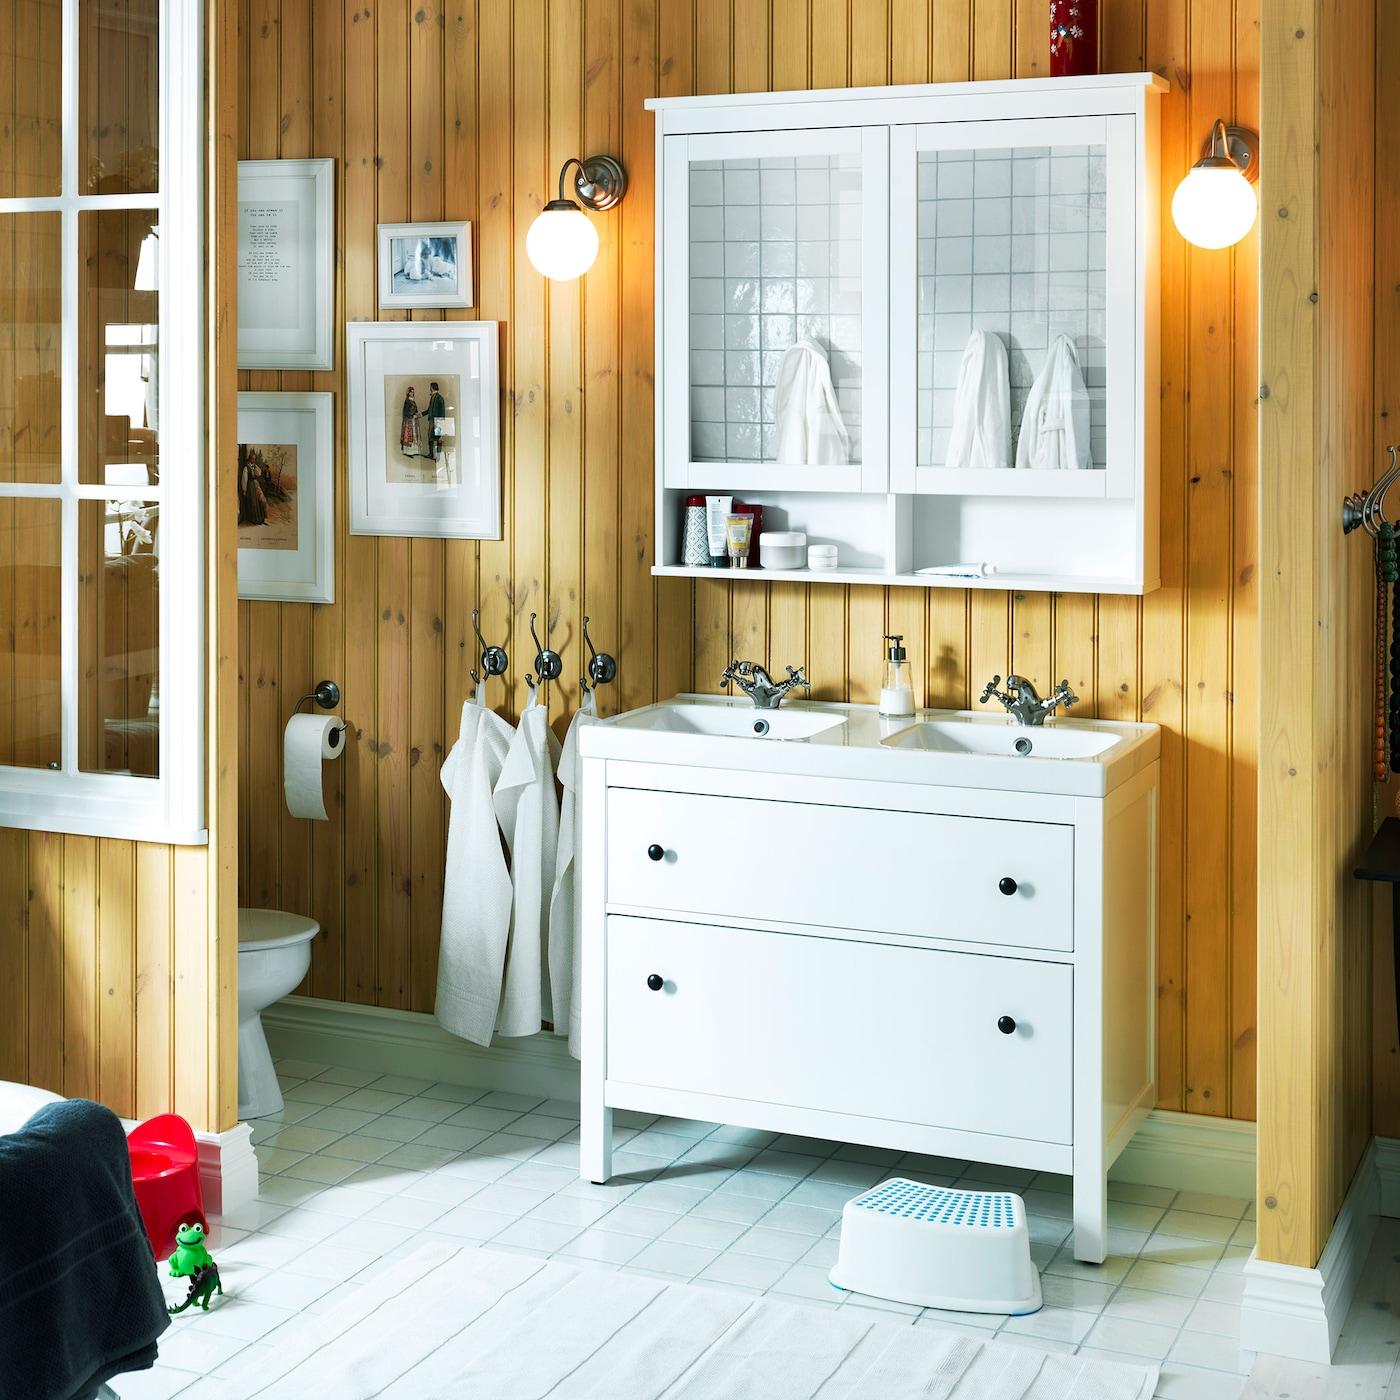 Agreable Salle De Bain : Serie HEMNES IKEA